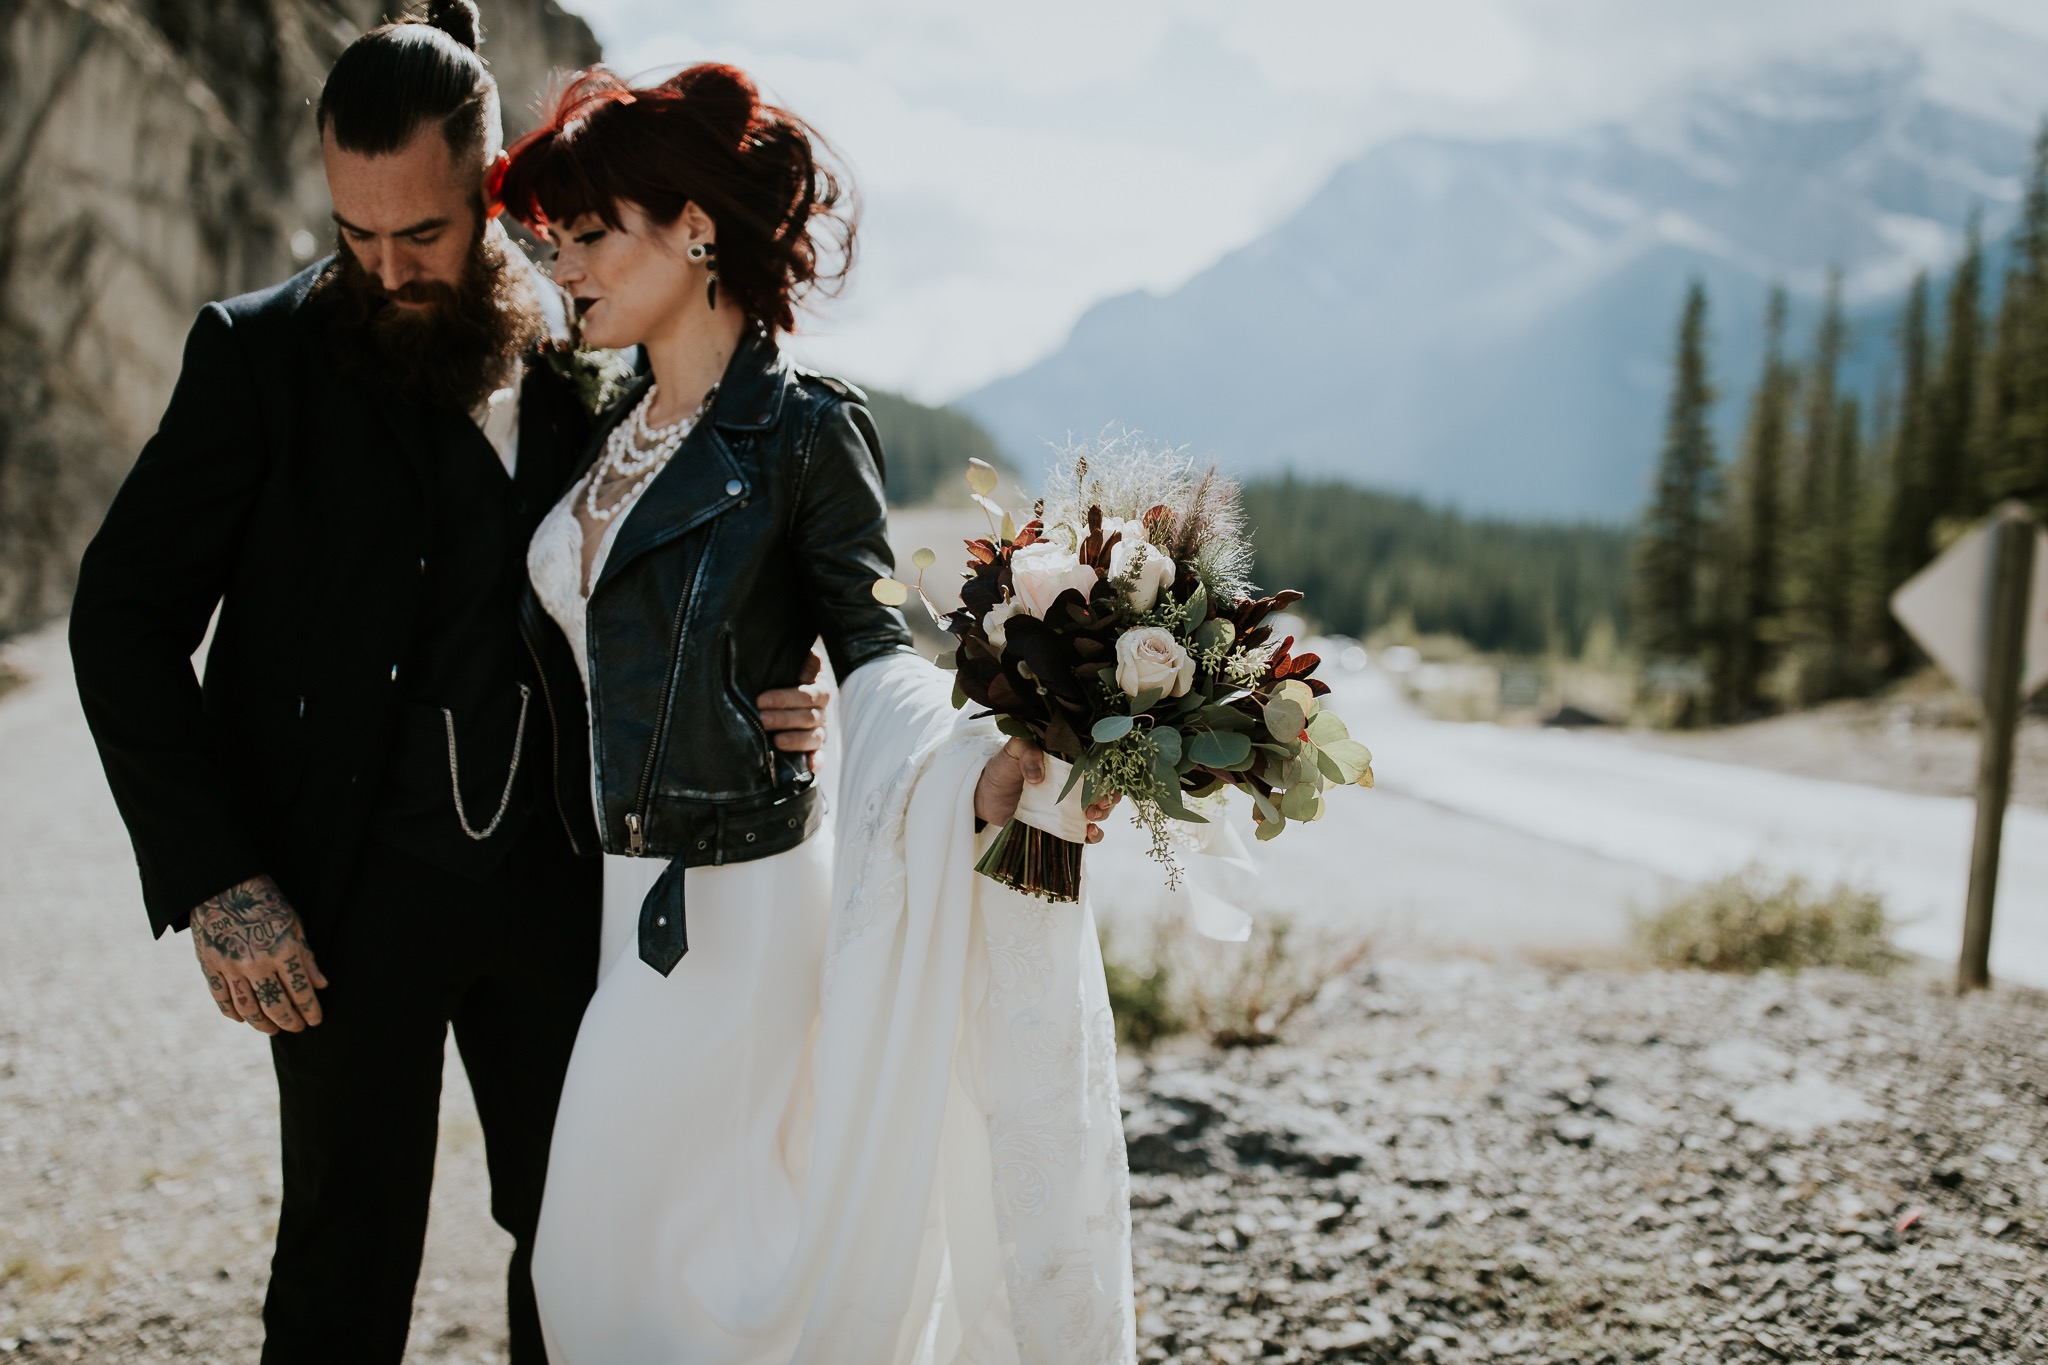 20170915-canmore-moody-wedding-photographer-creekside-creeksidestyledshoot-time&fate-5203